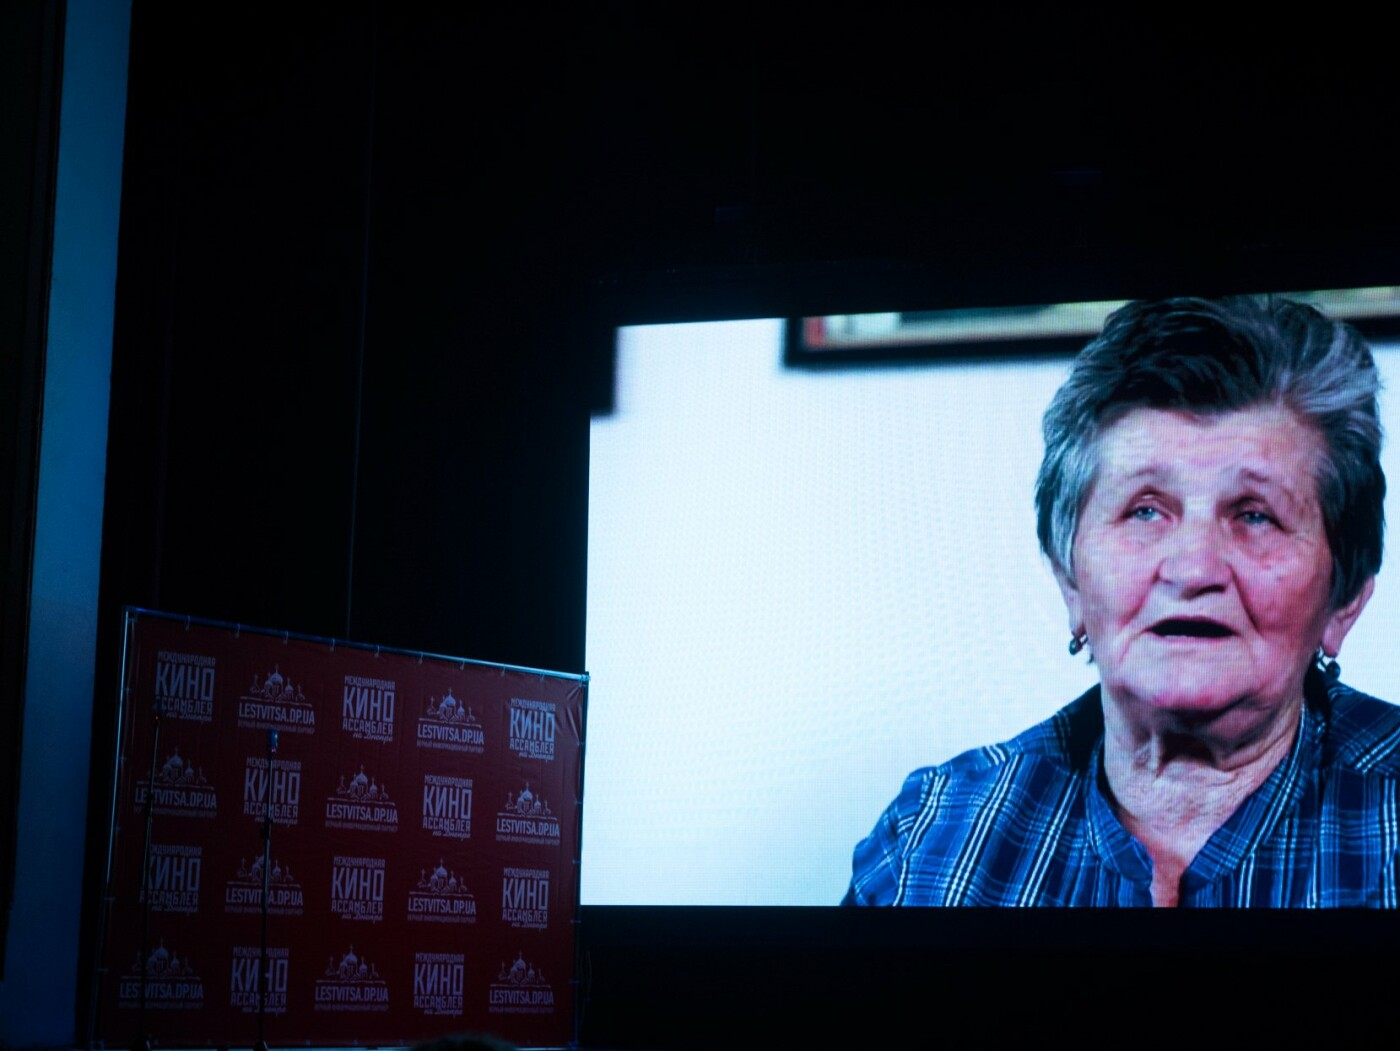 Киноассамблея на Днепре-2018: как прошла церемония открытия кинофорума (ФОТО), фото-5